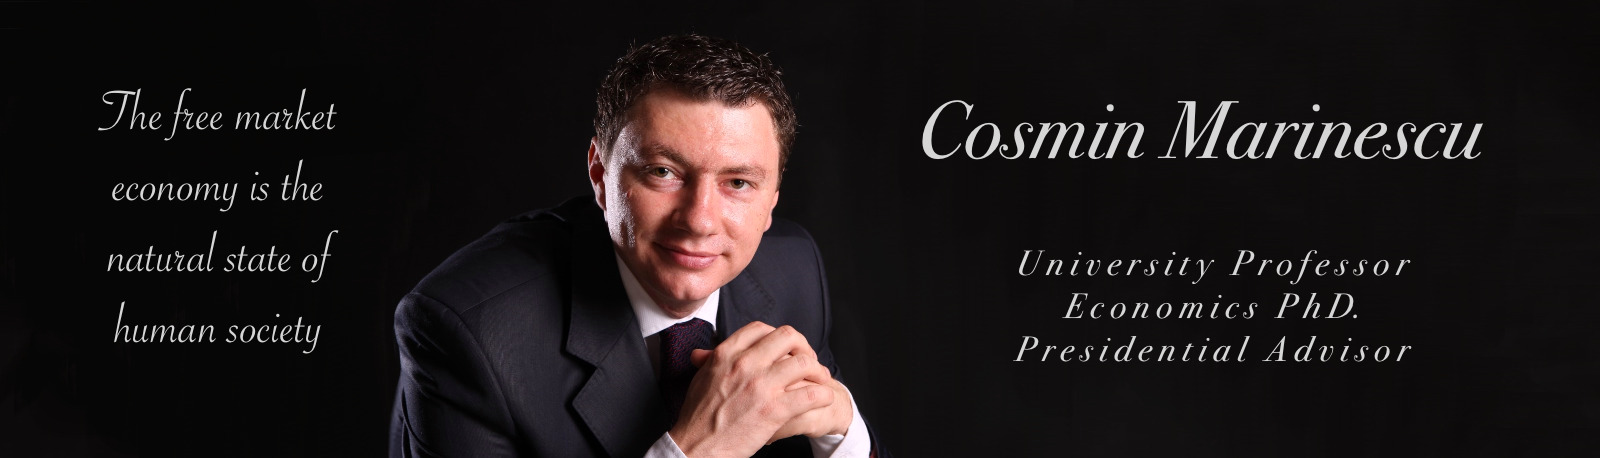 http://en.cosmin-marinescu.ro/wp-content/uploads/2017/10/Slide-1-EN.jpeg